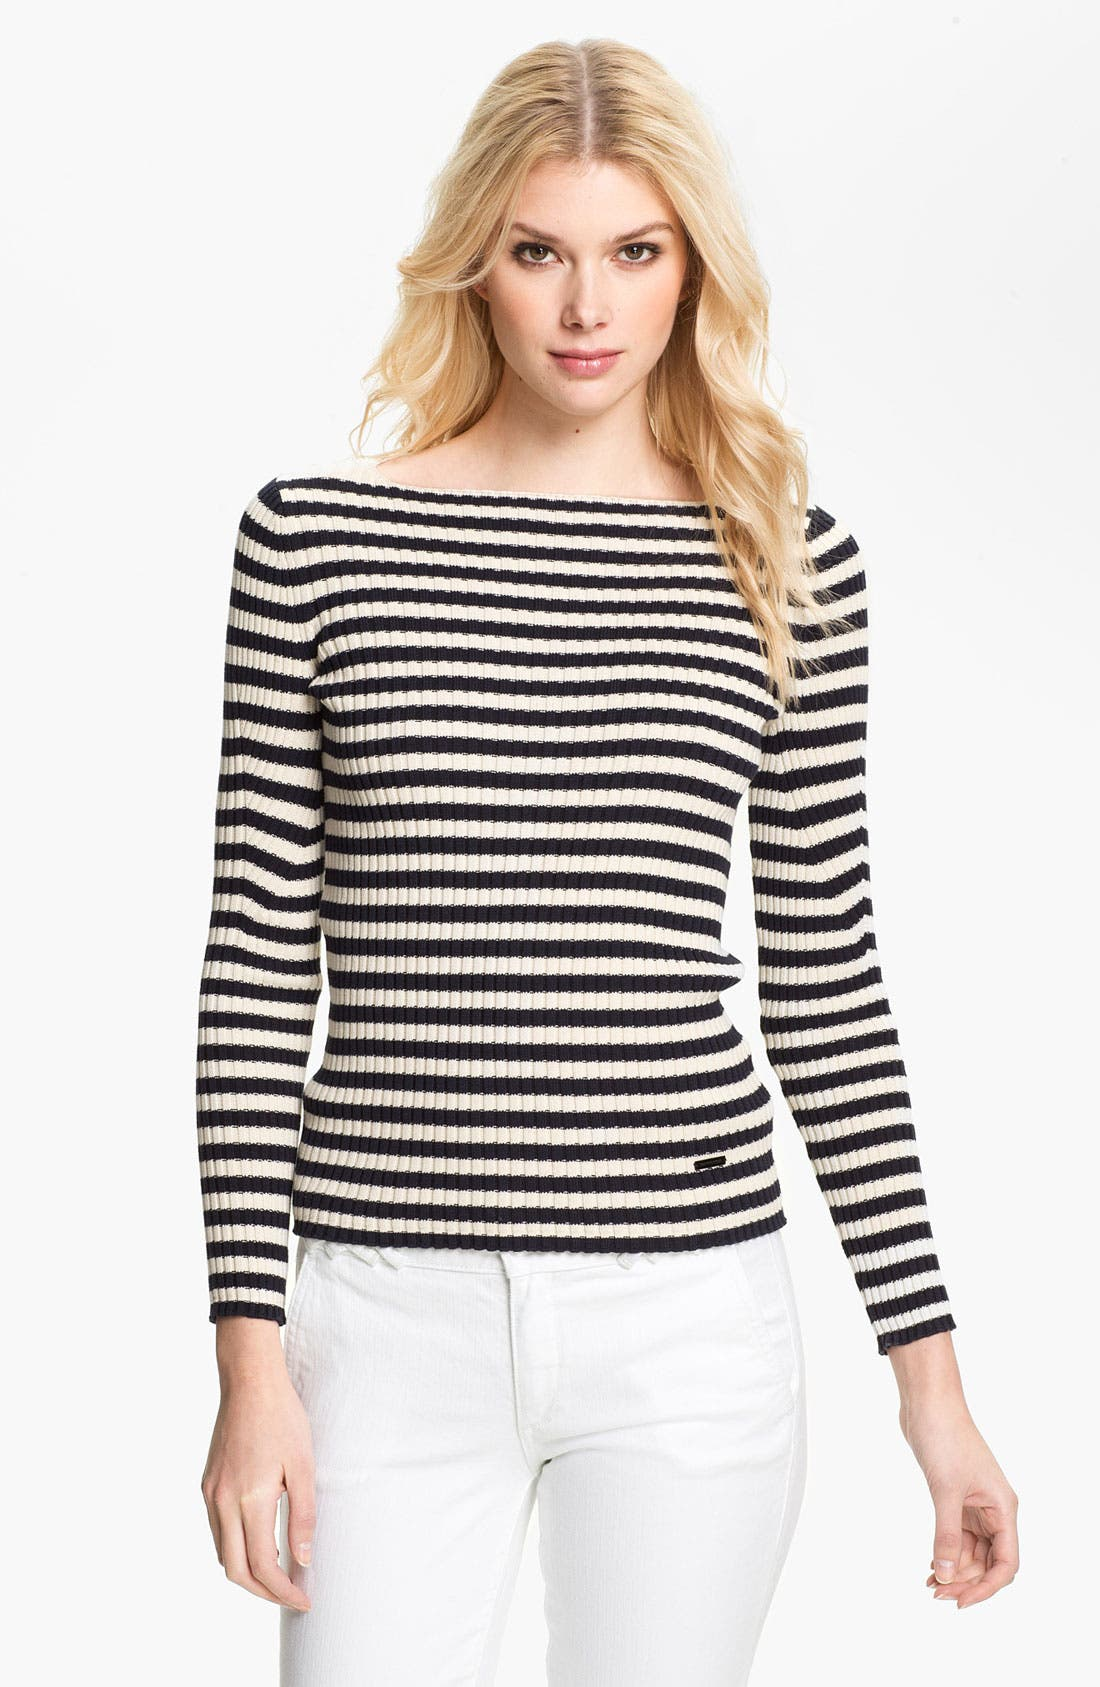 Alternate Image 1 Selected - Tory Burch 'Verona' Stripe Sweater